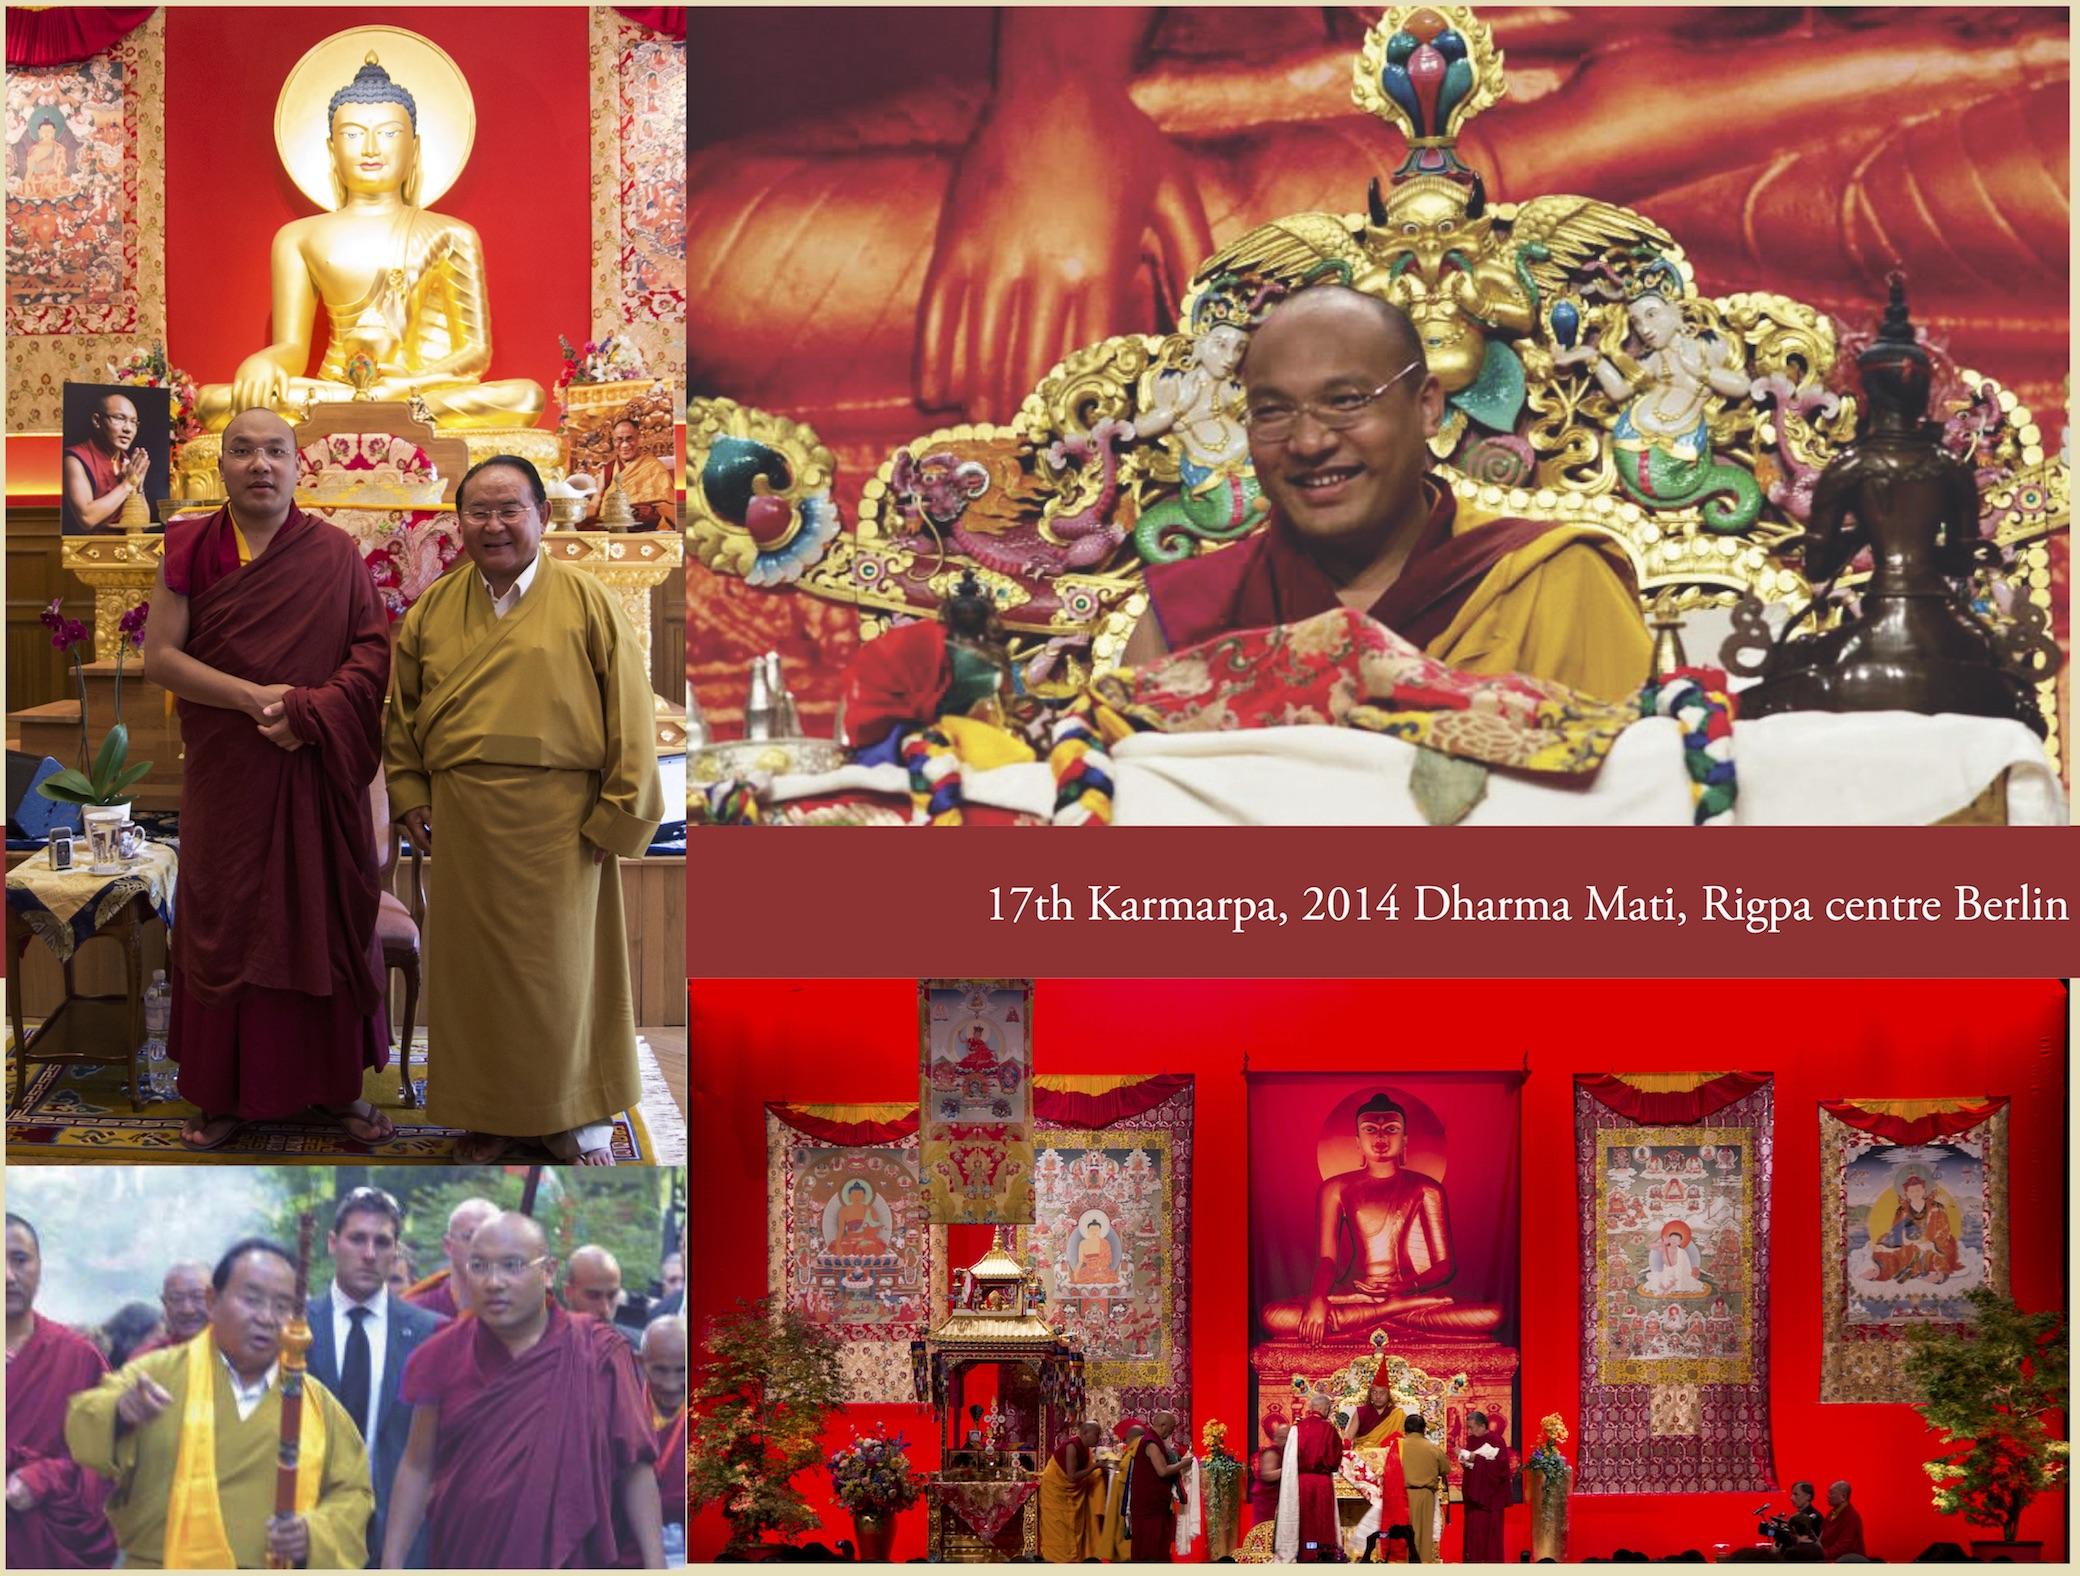 17th Karmarpa, 2014 Dharma Mati, Rigpa centre Berlin